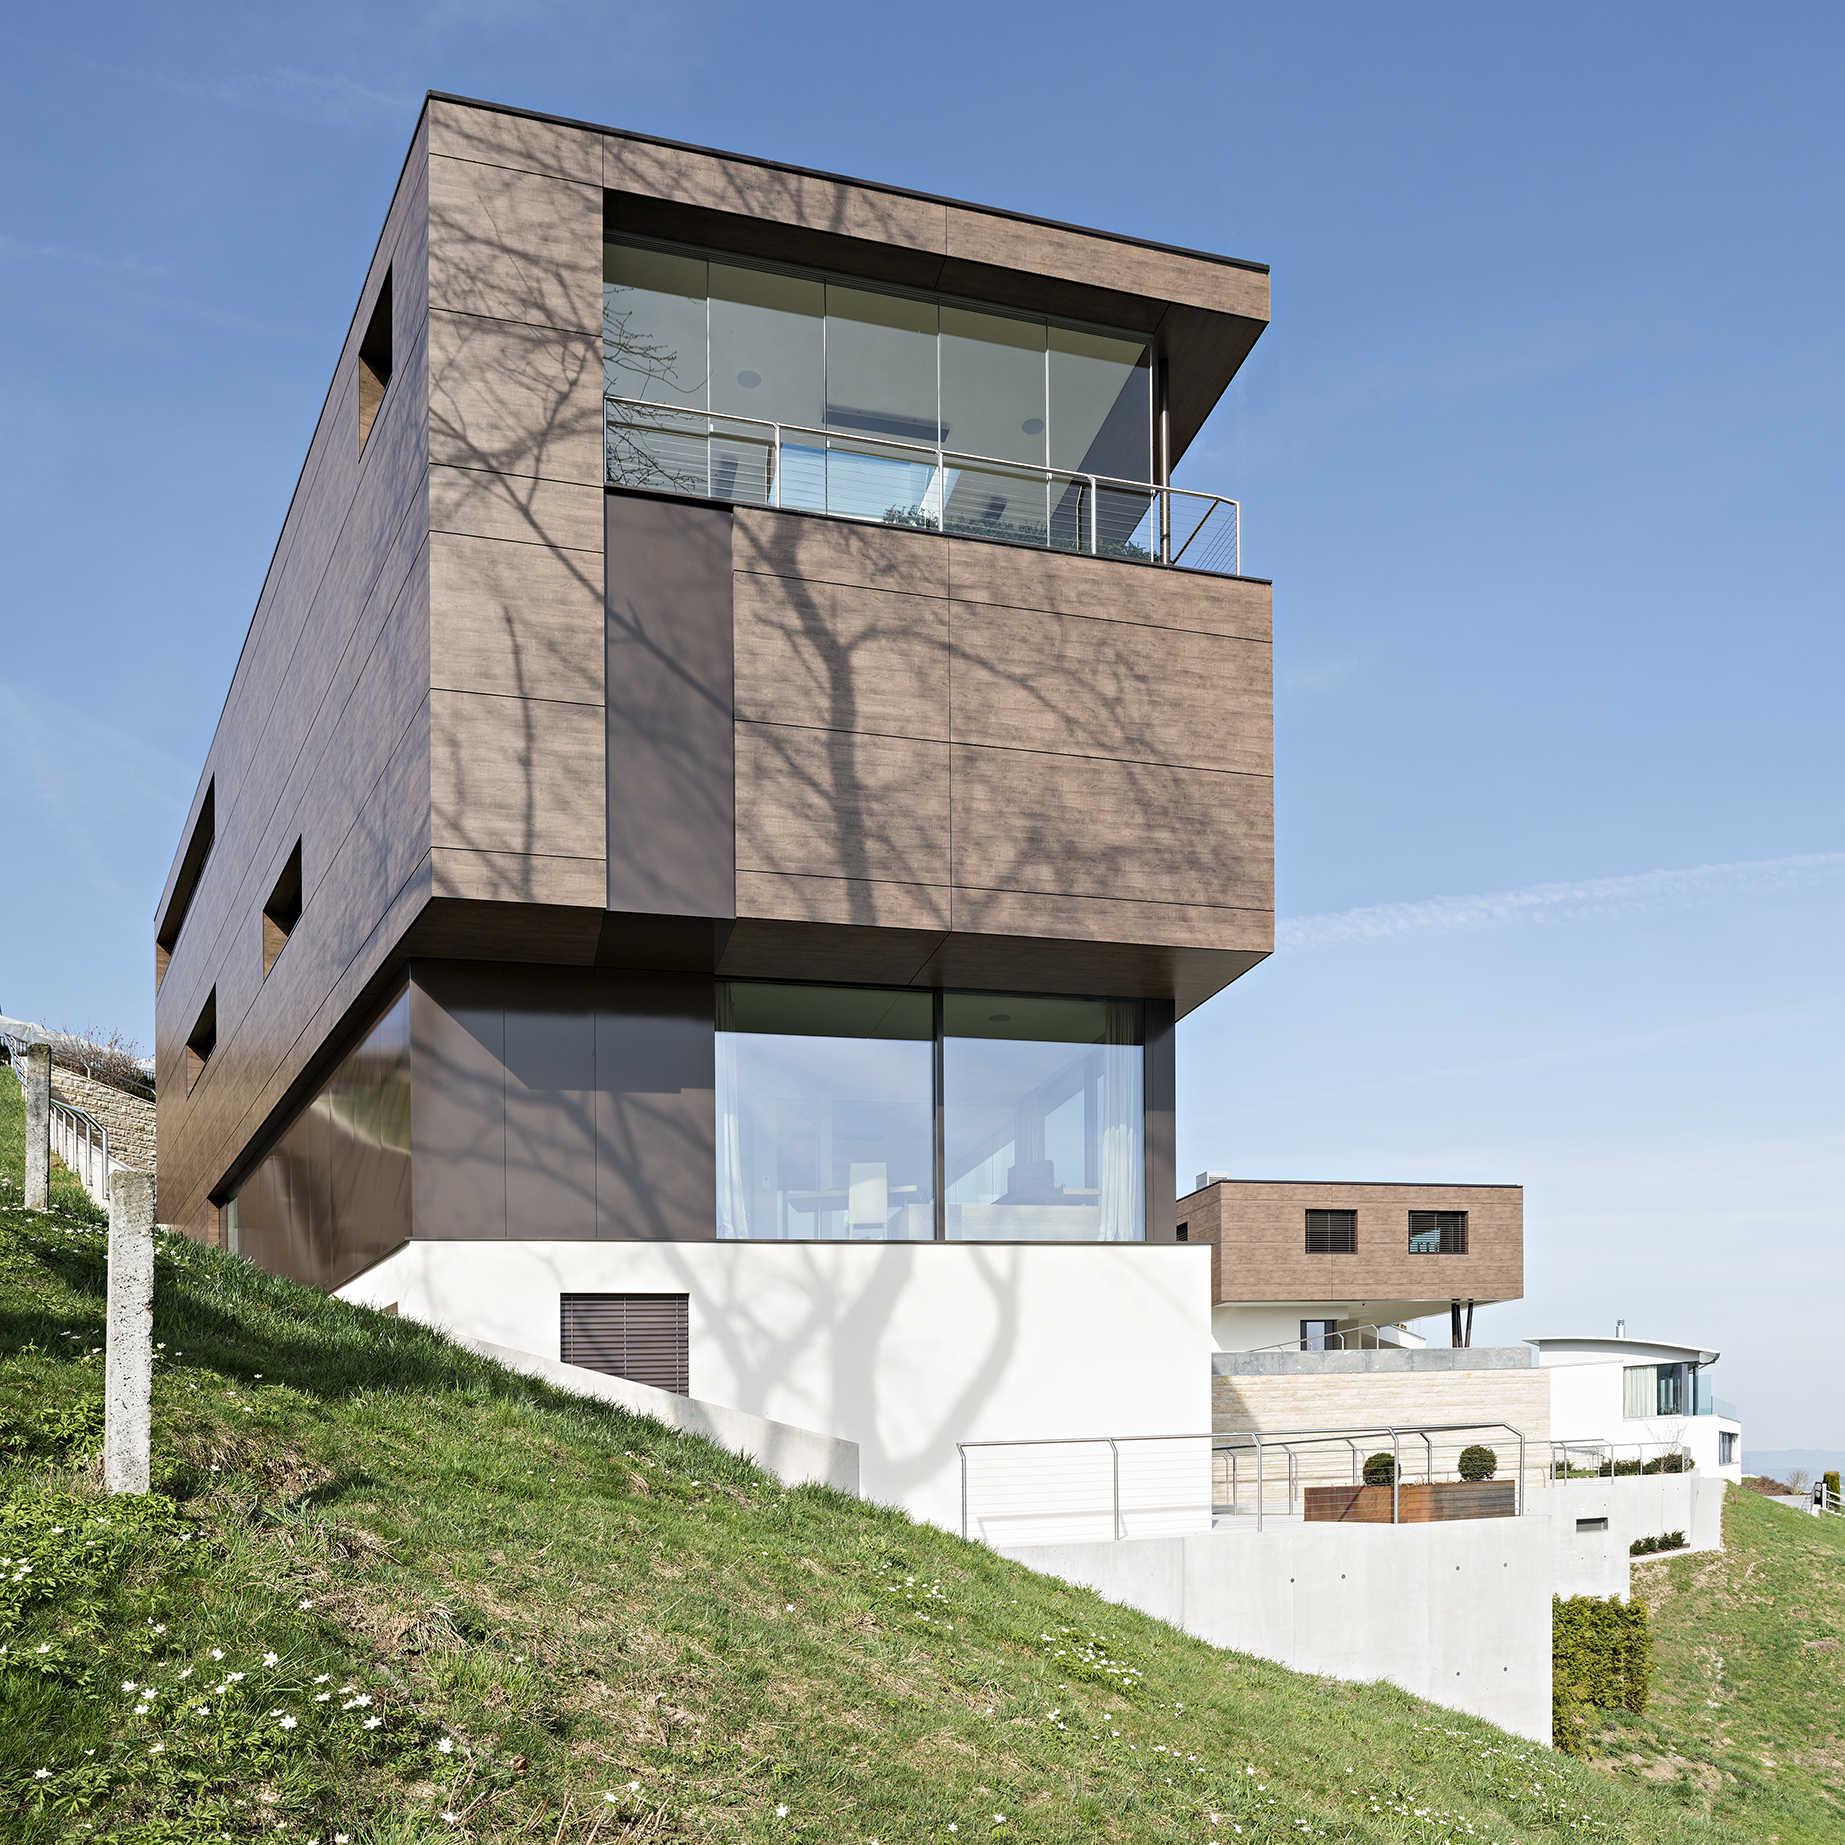 ch_individualhousing_02